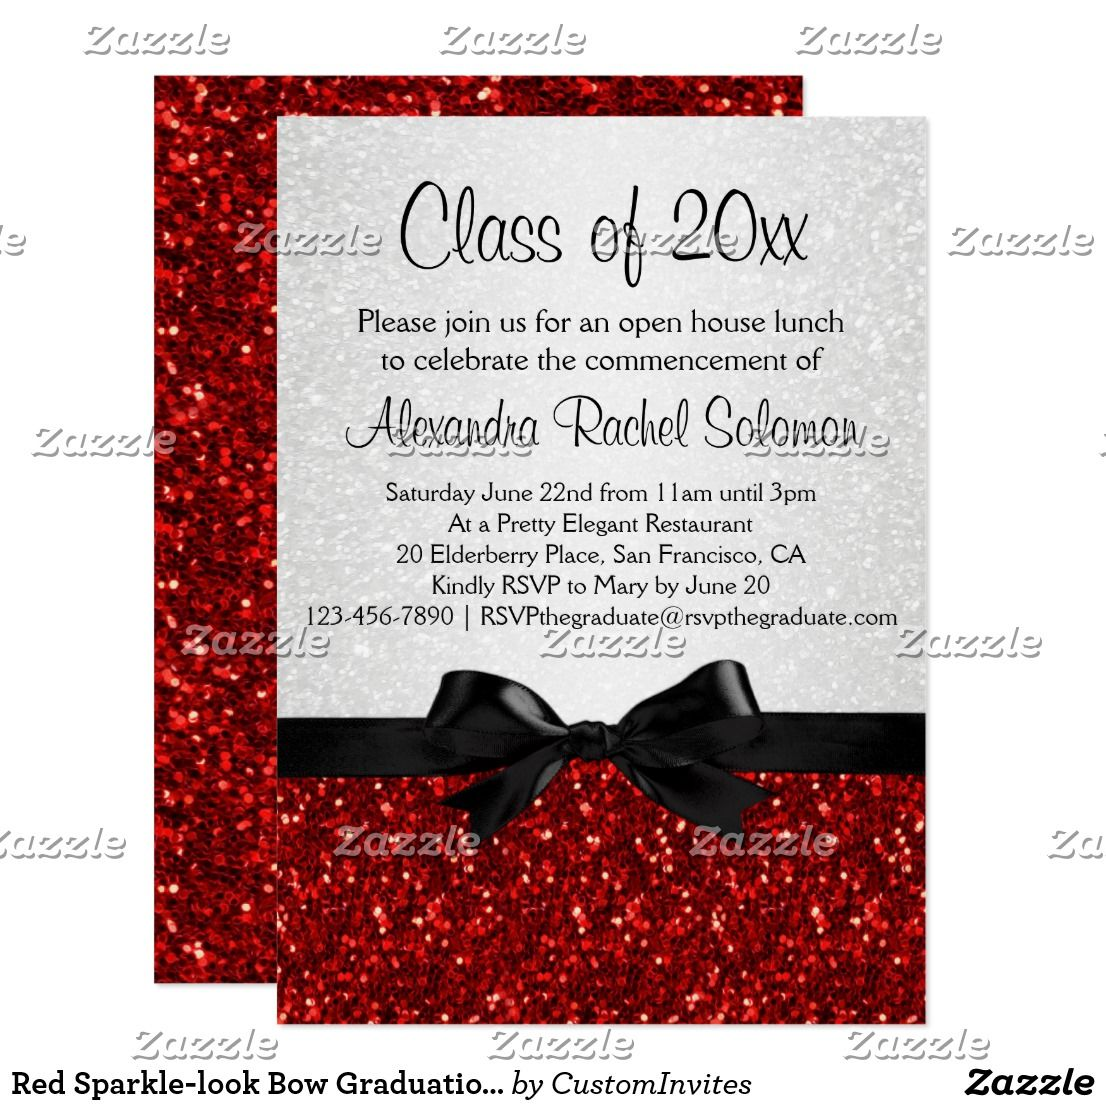 Red Sparkle-look Bow Graduation Invitation | Pinterest